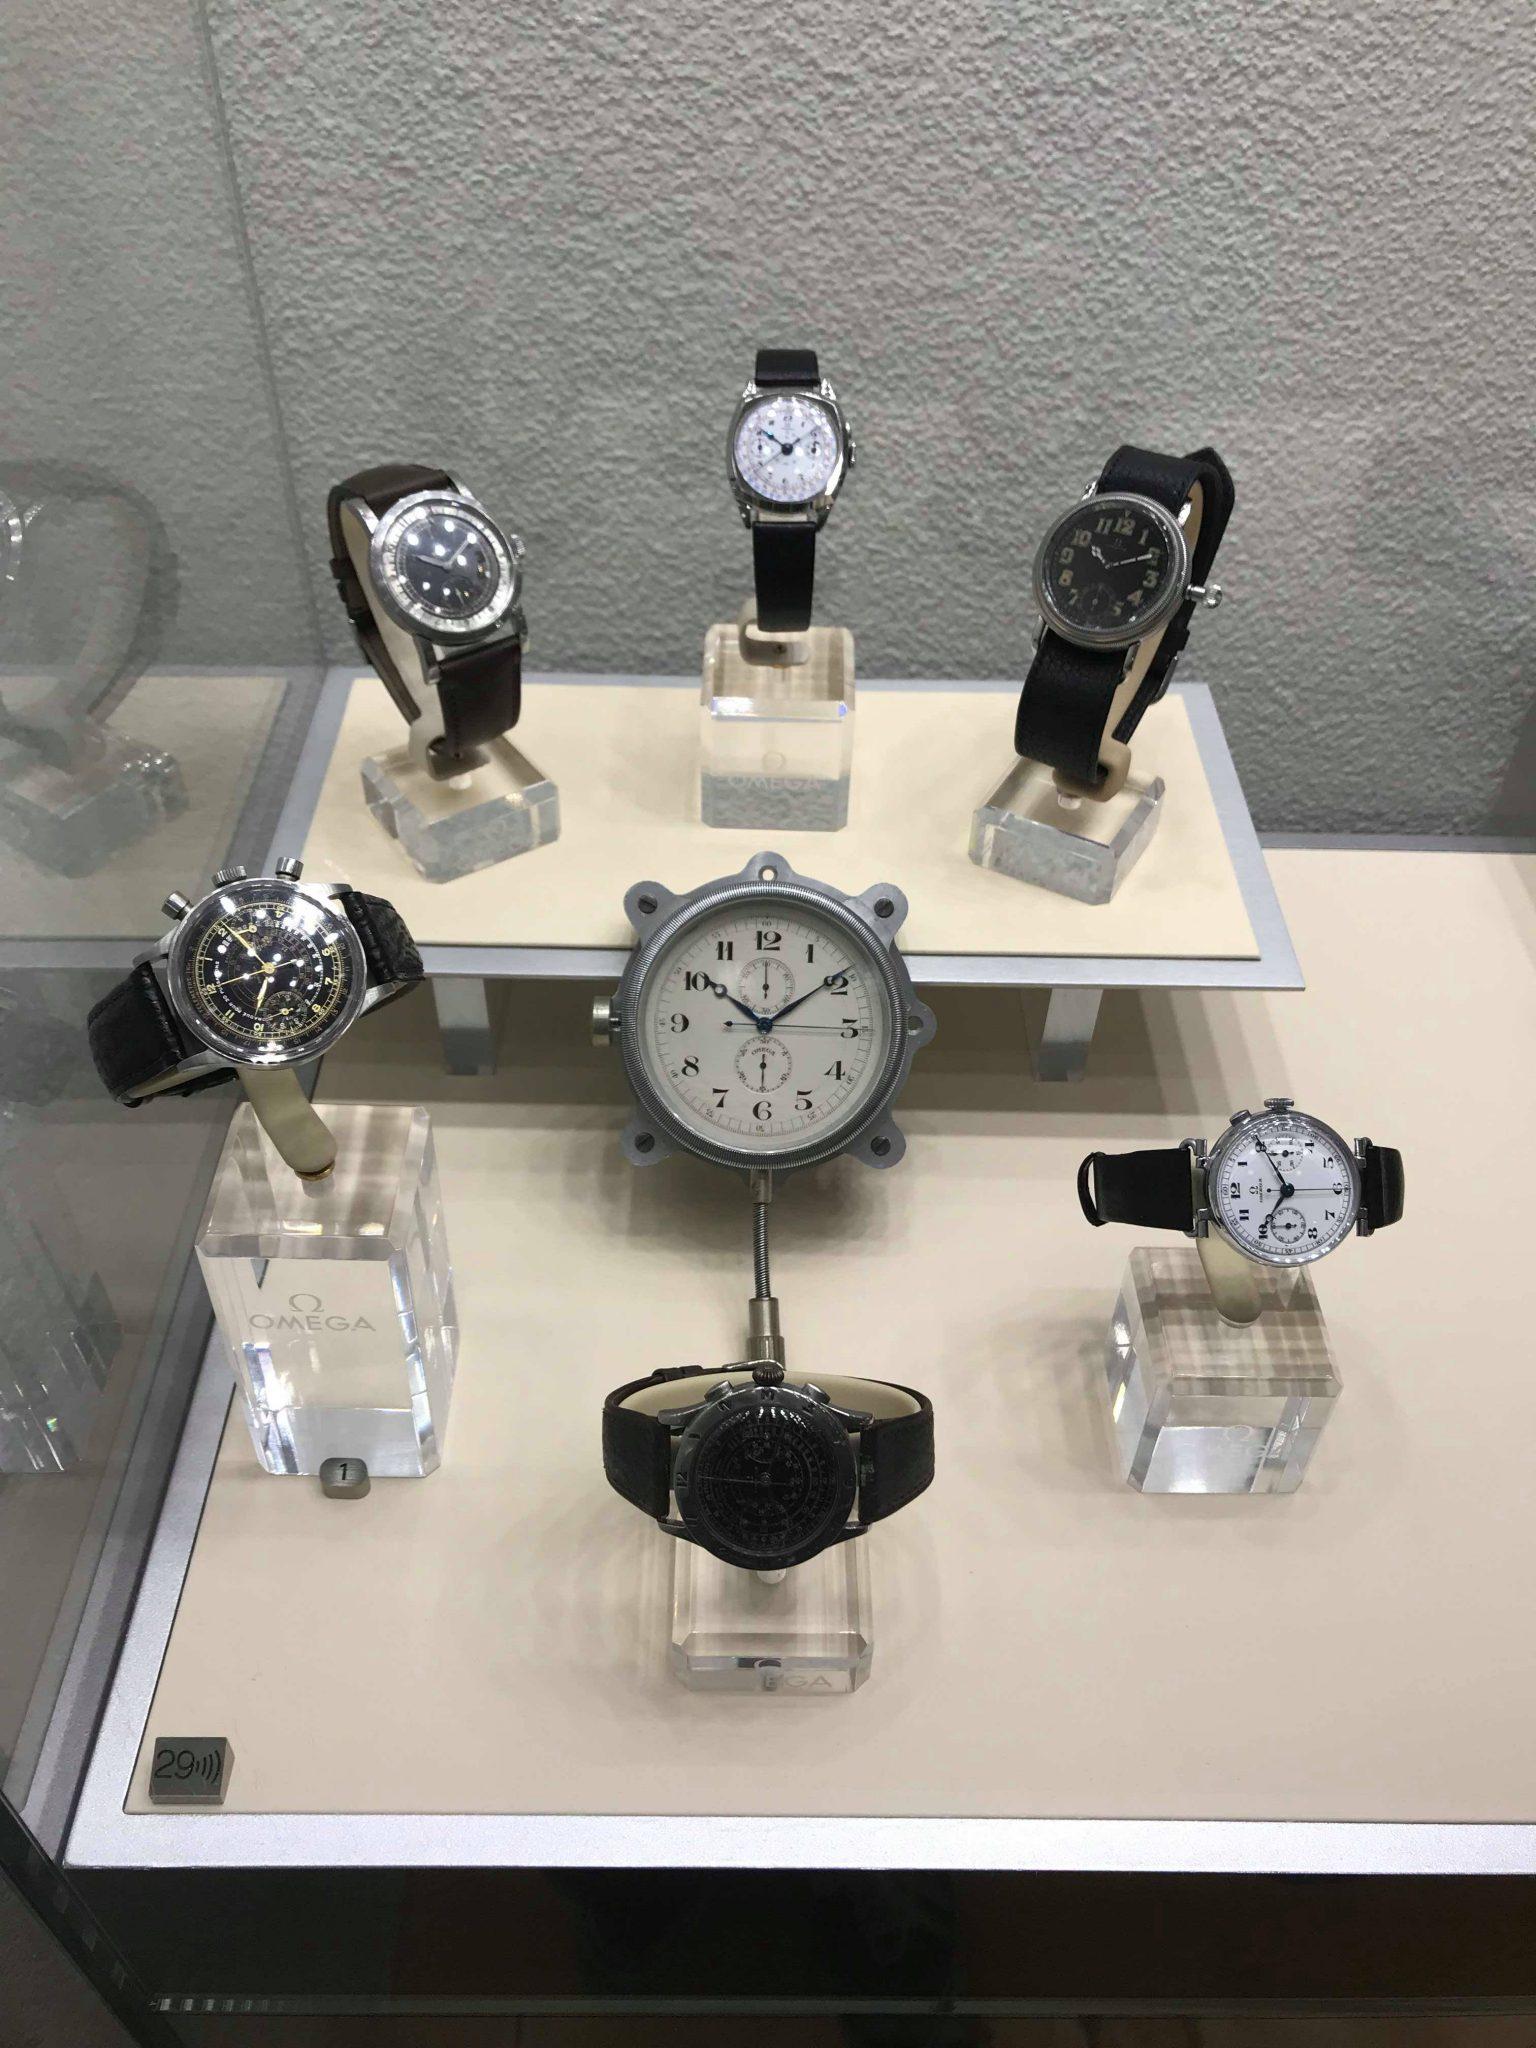 omega military watch, Omega museum, Biel, Switzerland